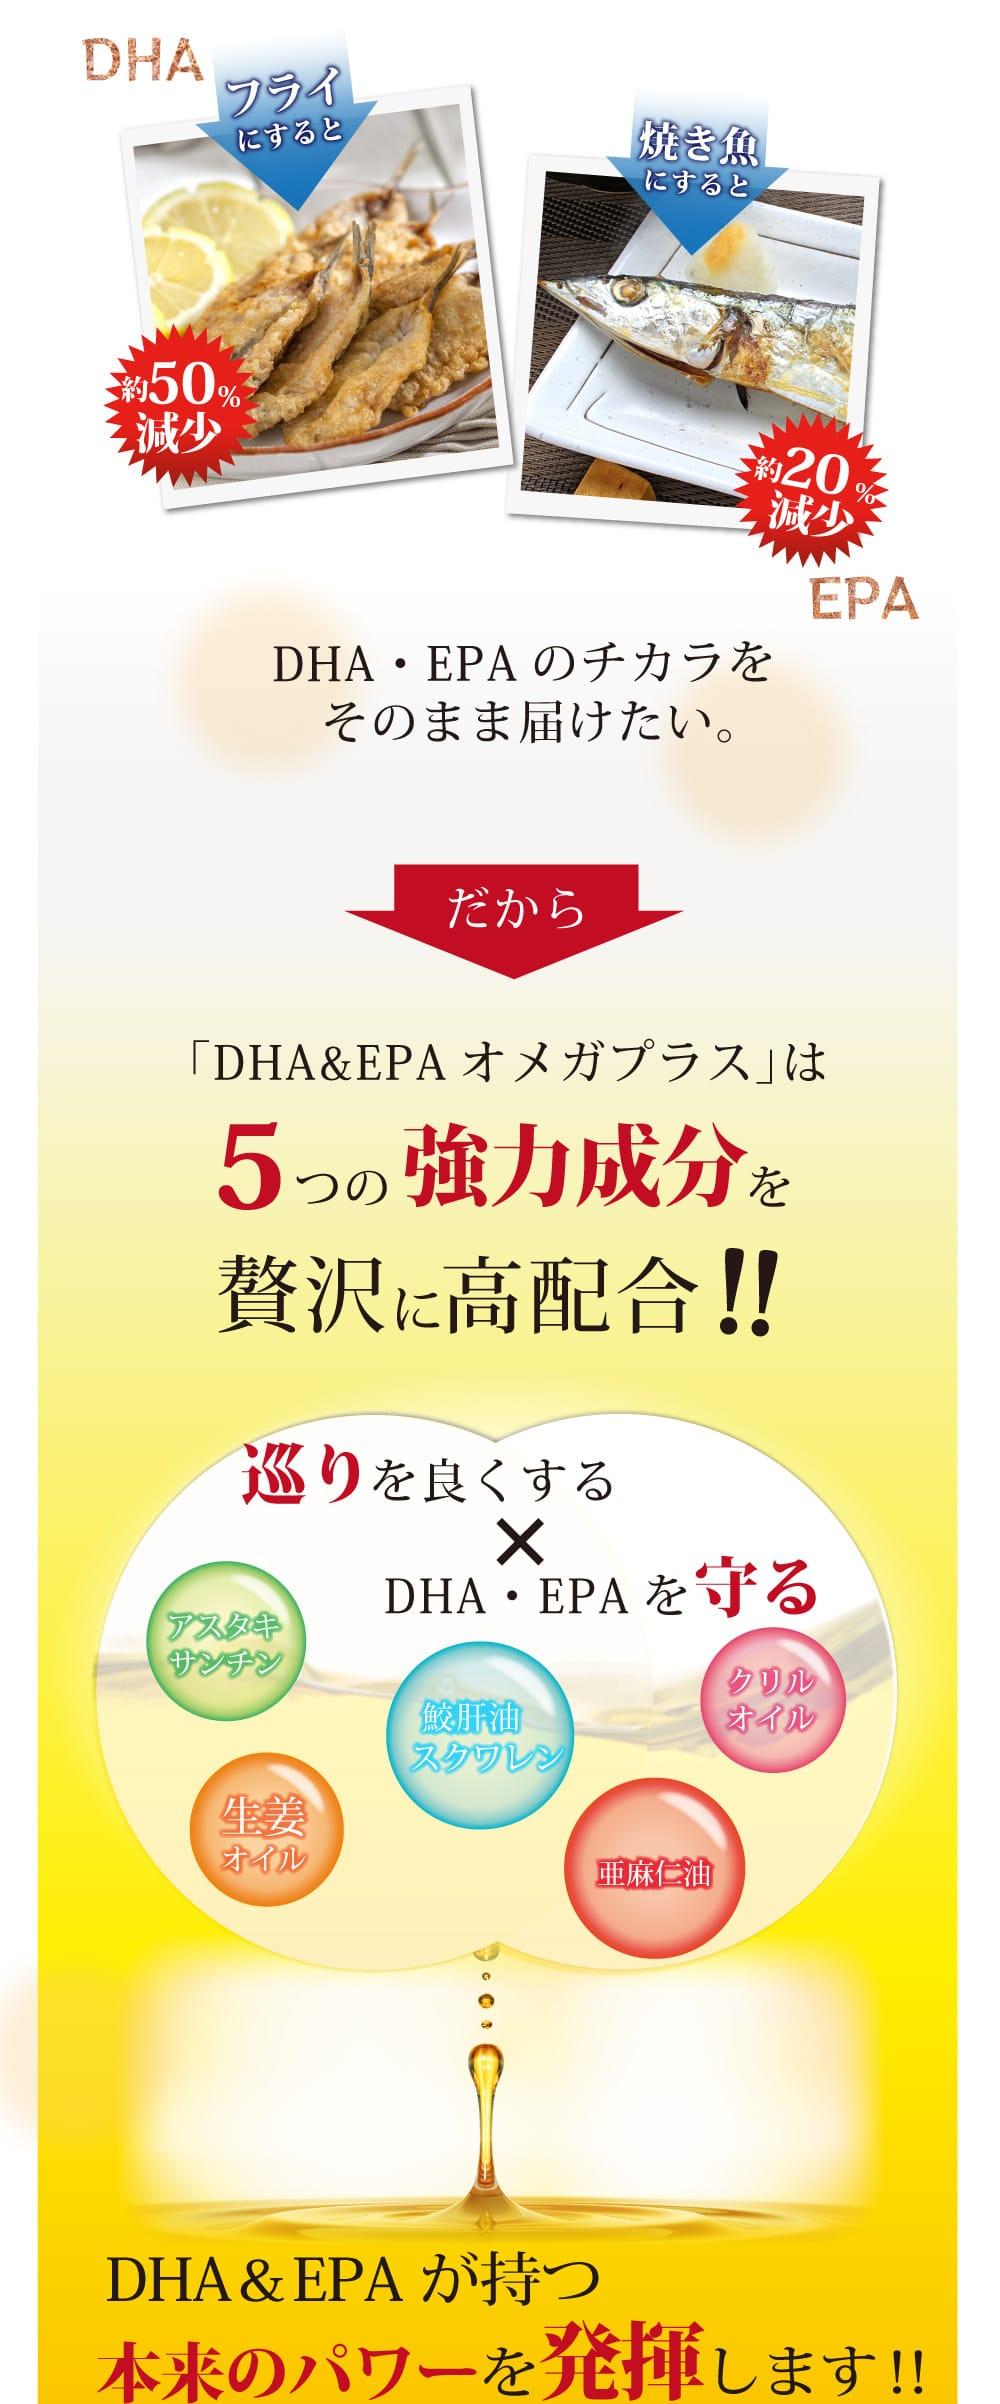 DHAとEPAの弱点をサポートするスクワレン、オリーブスクワレン、亜麻仁油、アスタキサンチン、クリルオイルの5つの強力な成分を配合しました。